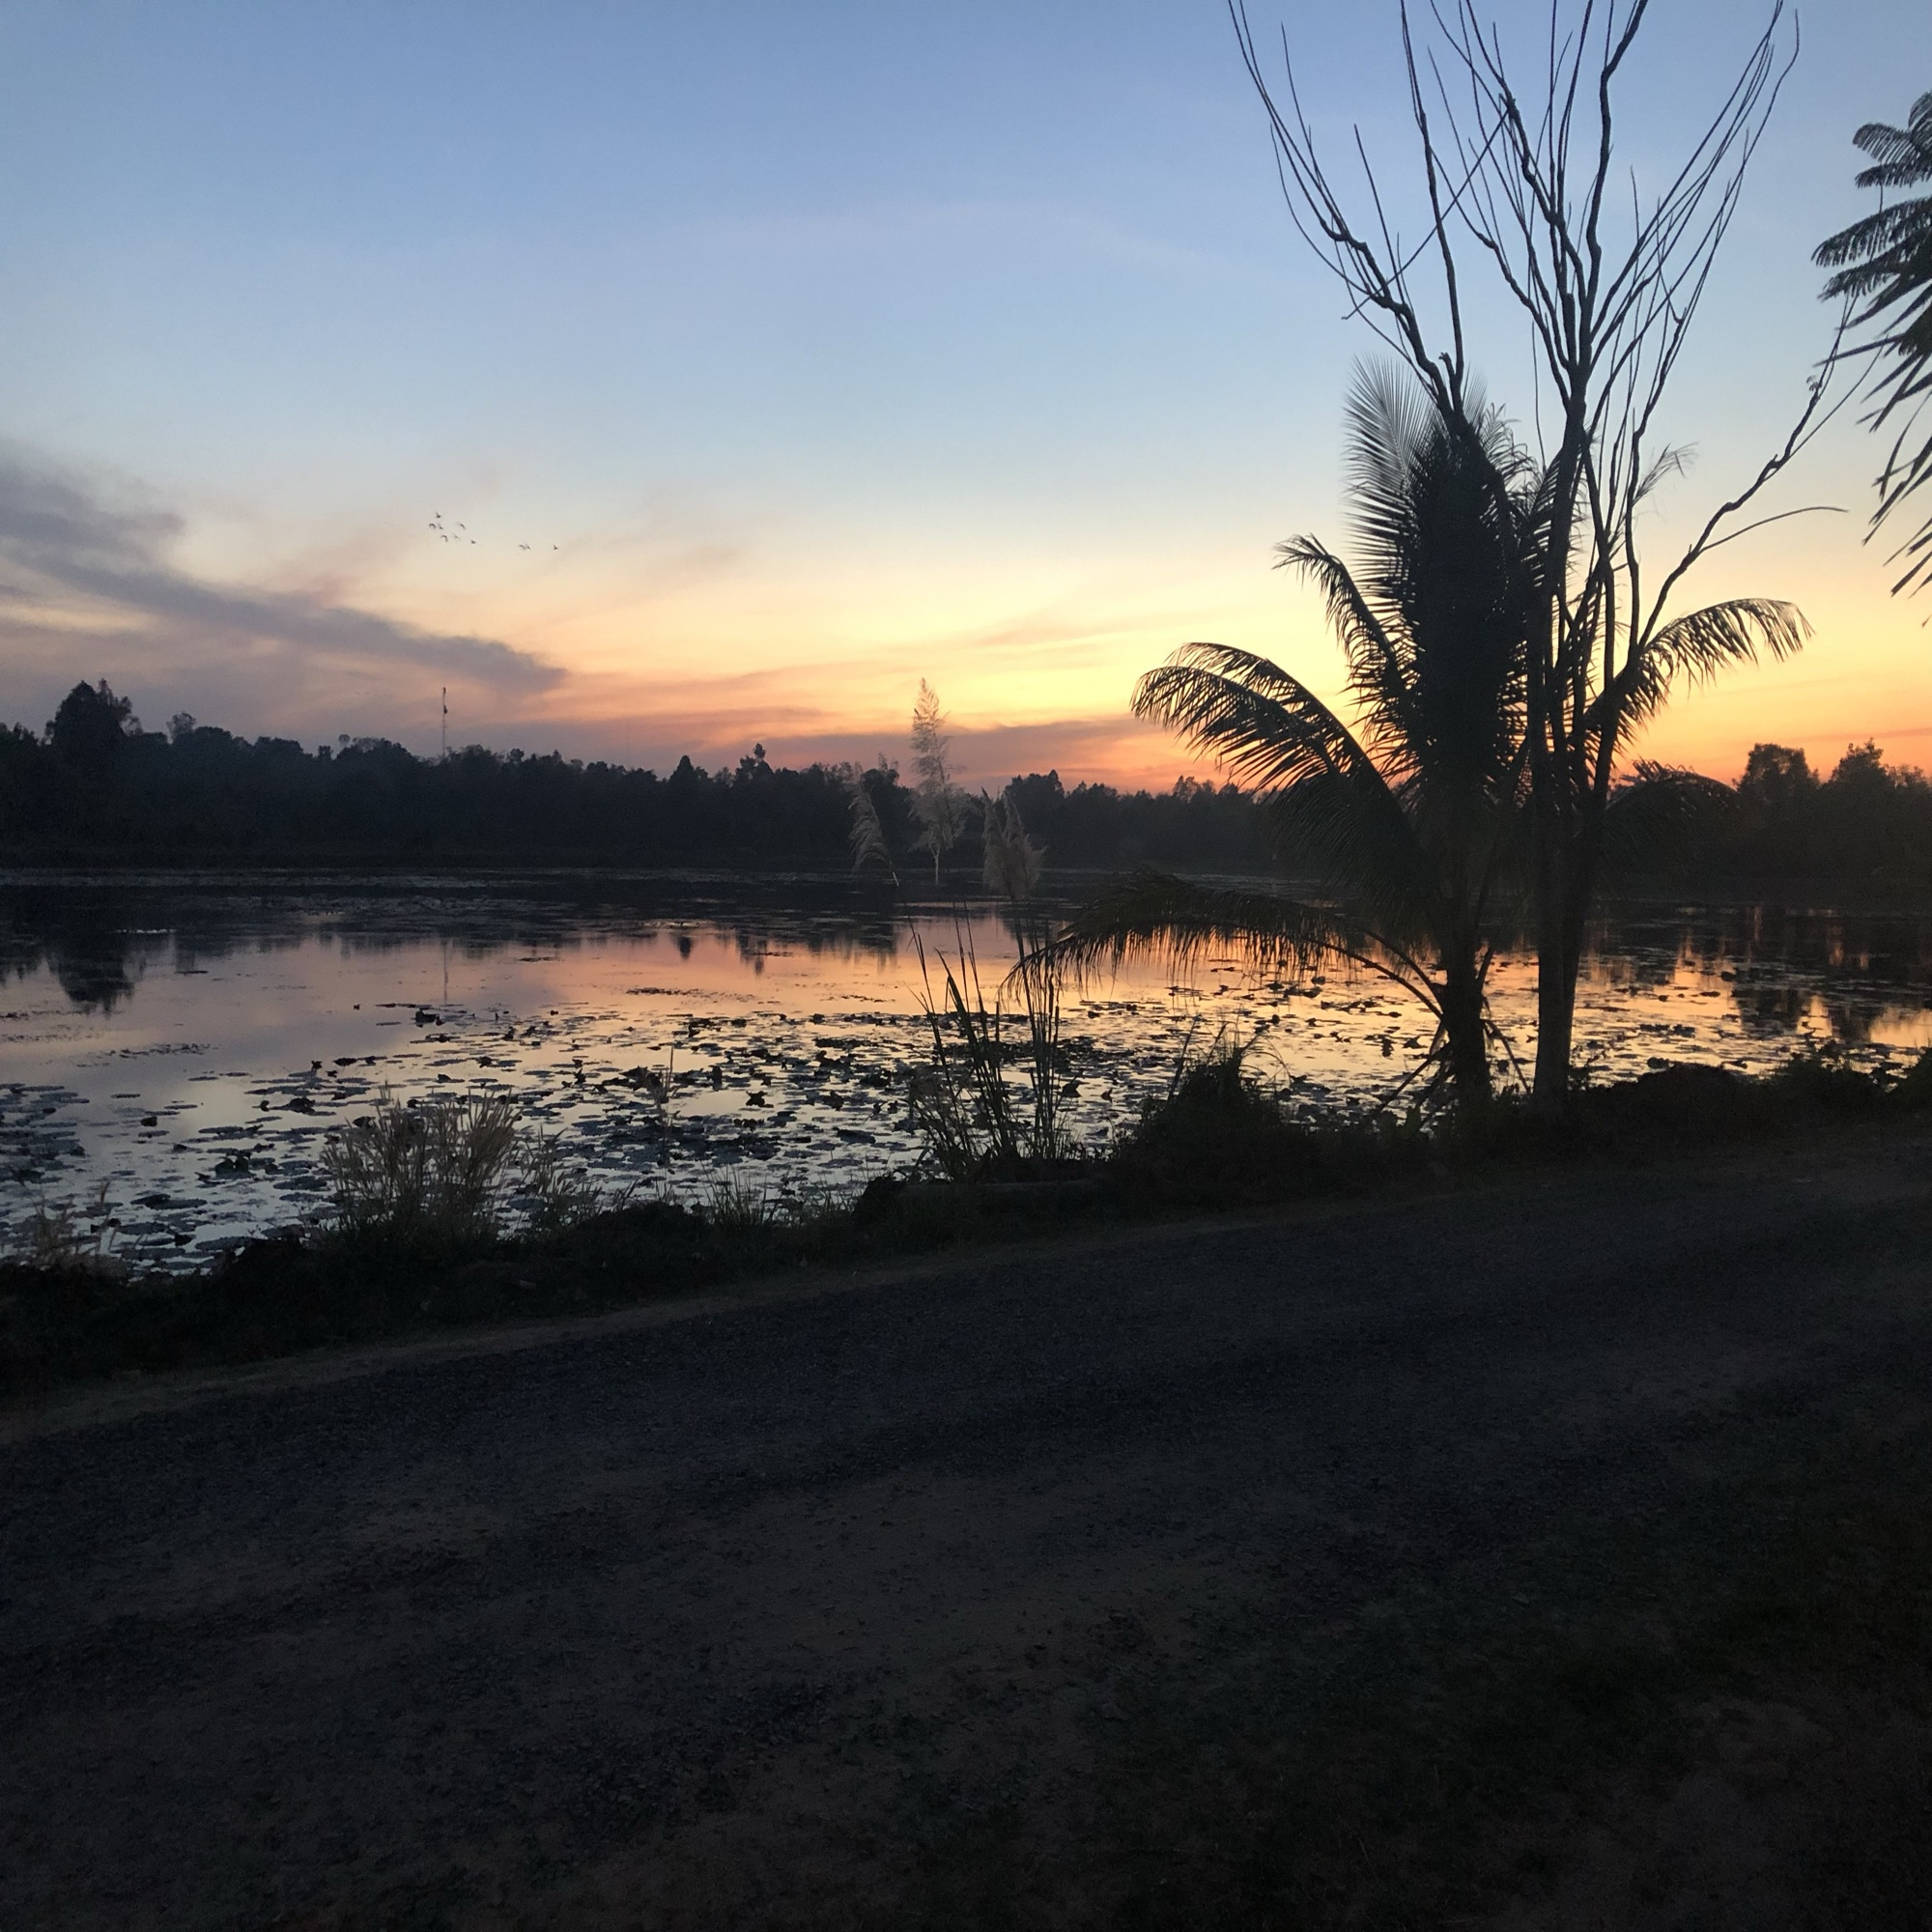 Dag Thailand, hallo Laos...